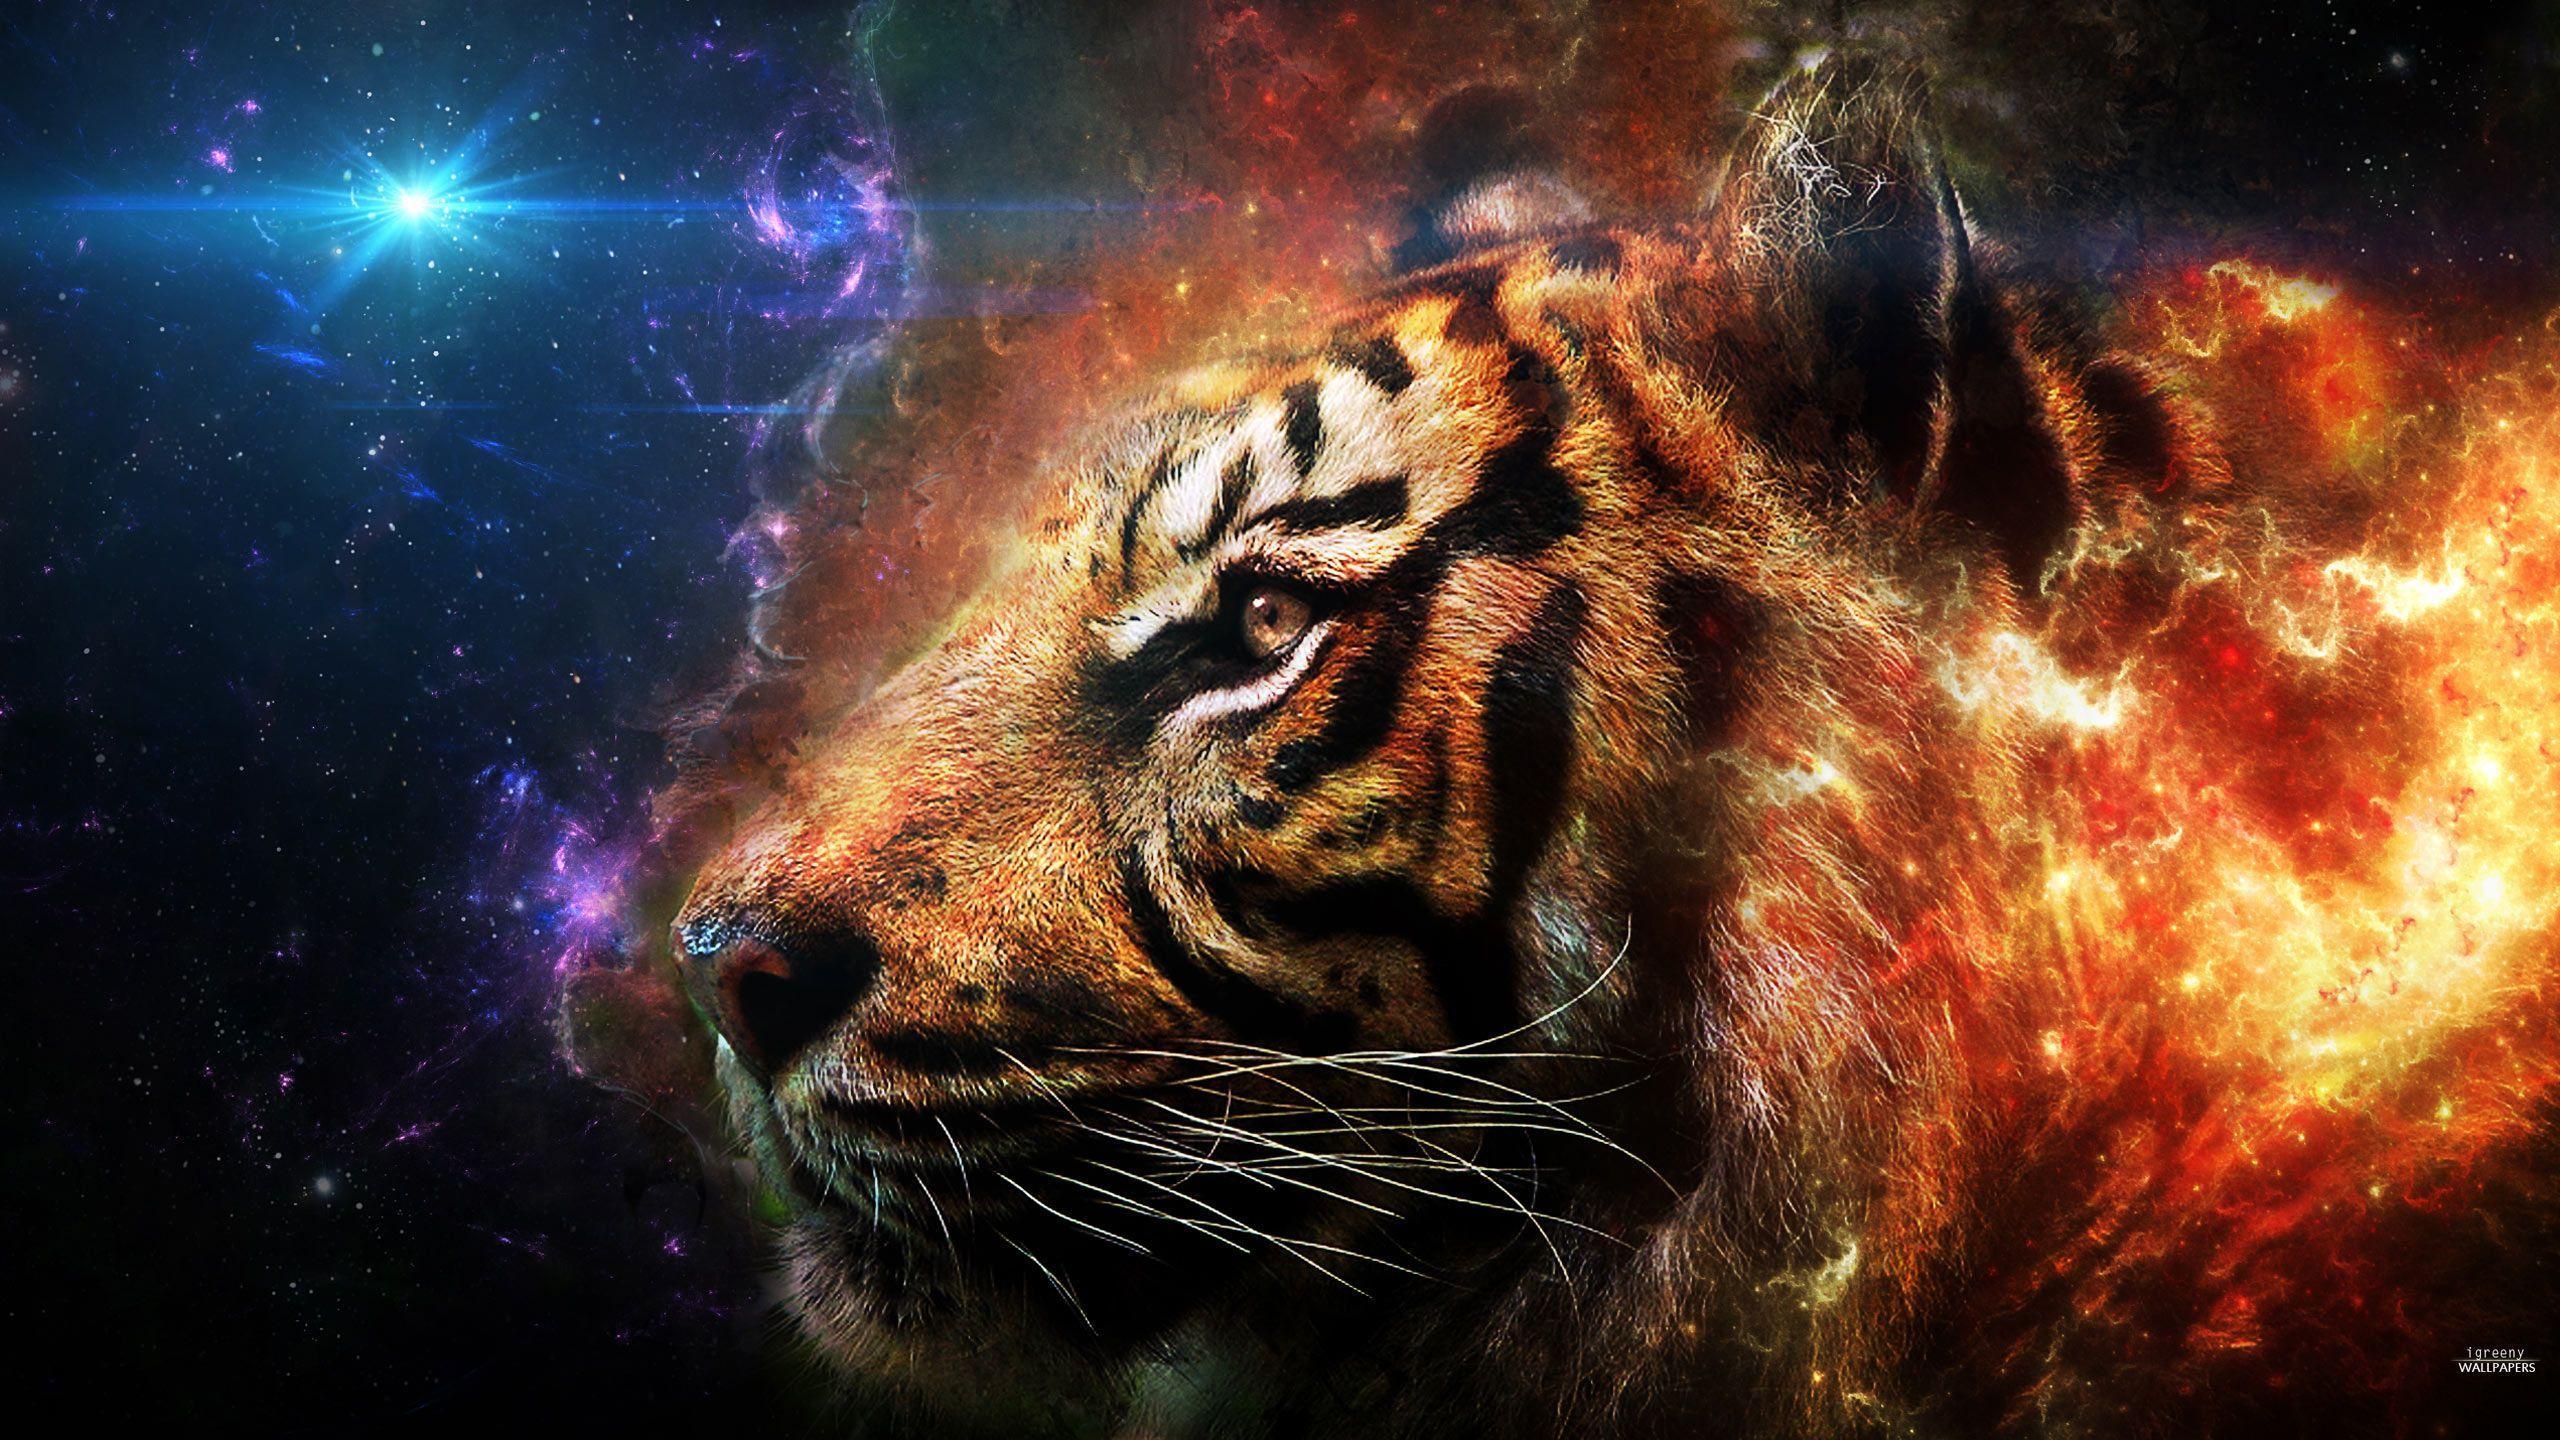 Free Wallpapers - Tiger Head 2560x1440 wallpaper